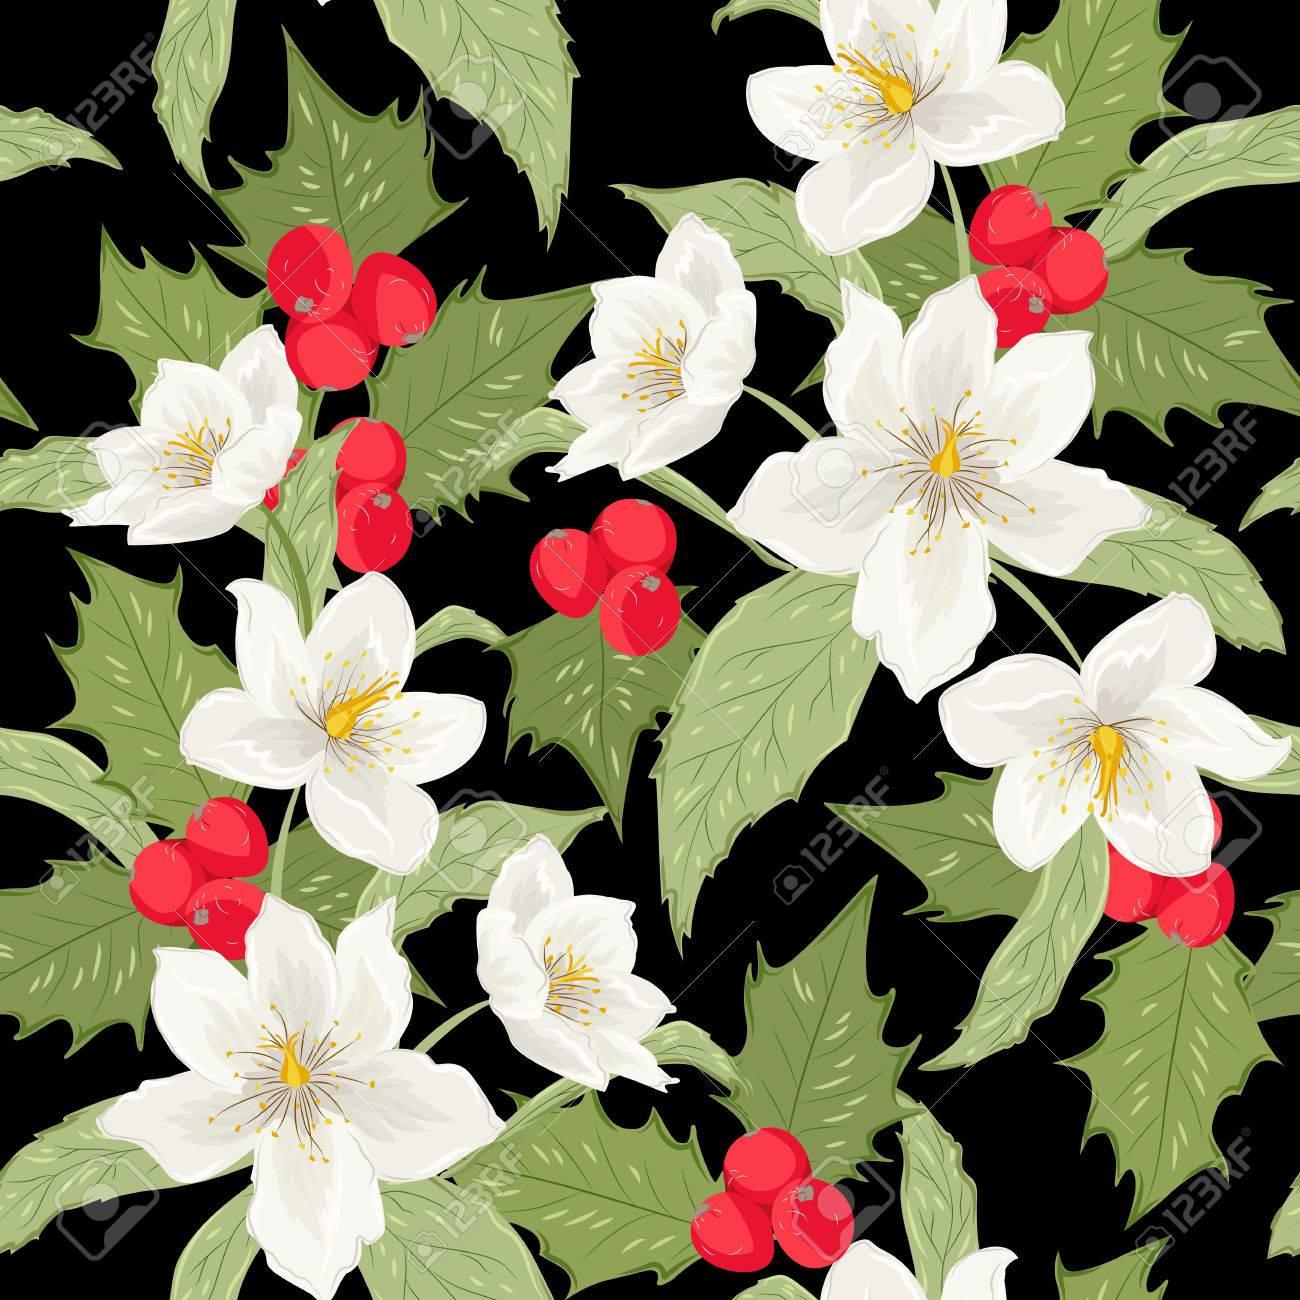 Weihnachten Winter Rosenblüten Blätter Holly Berry Nahtlose Muster ...